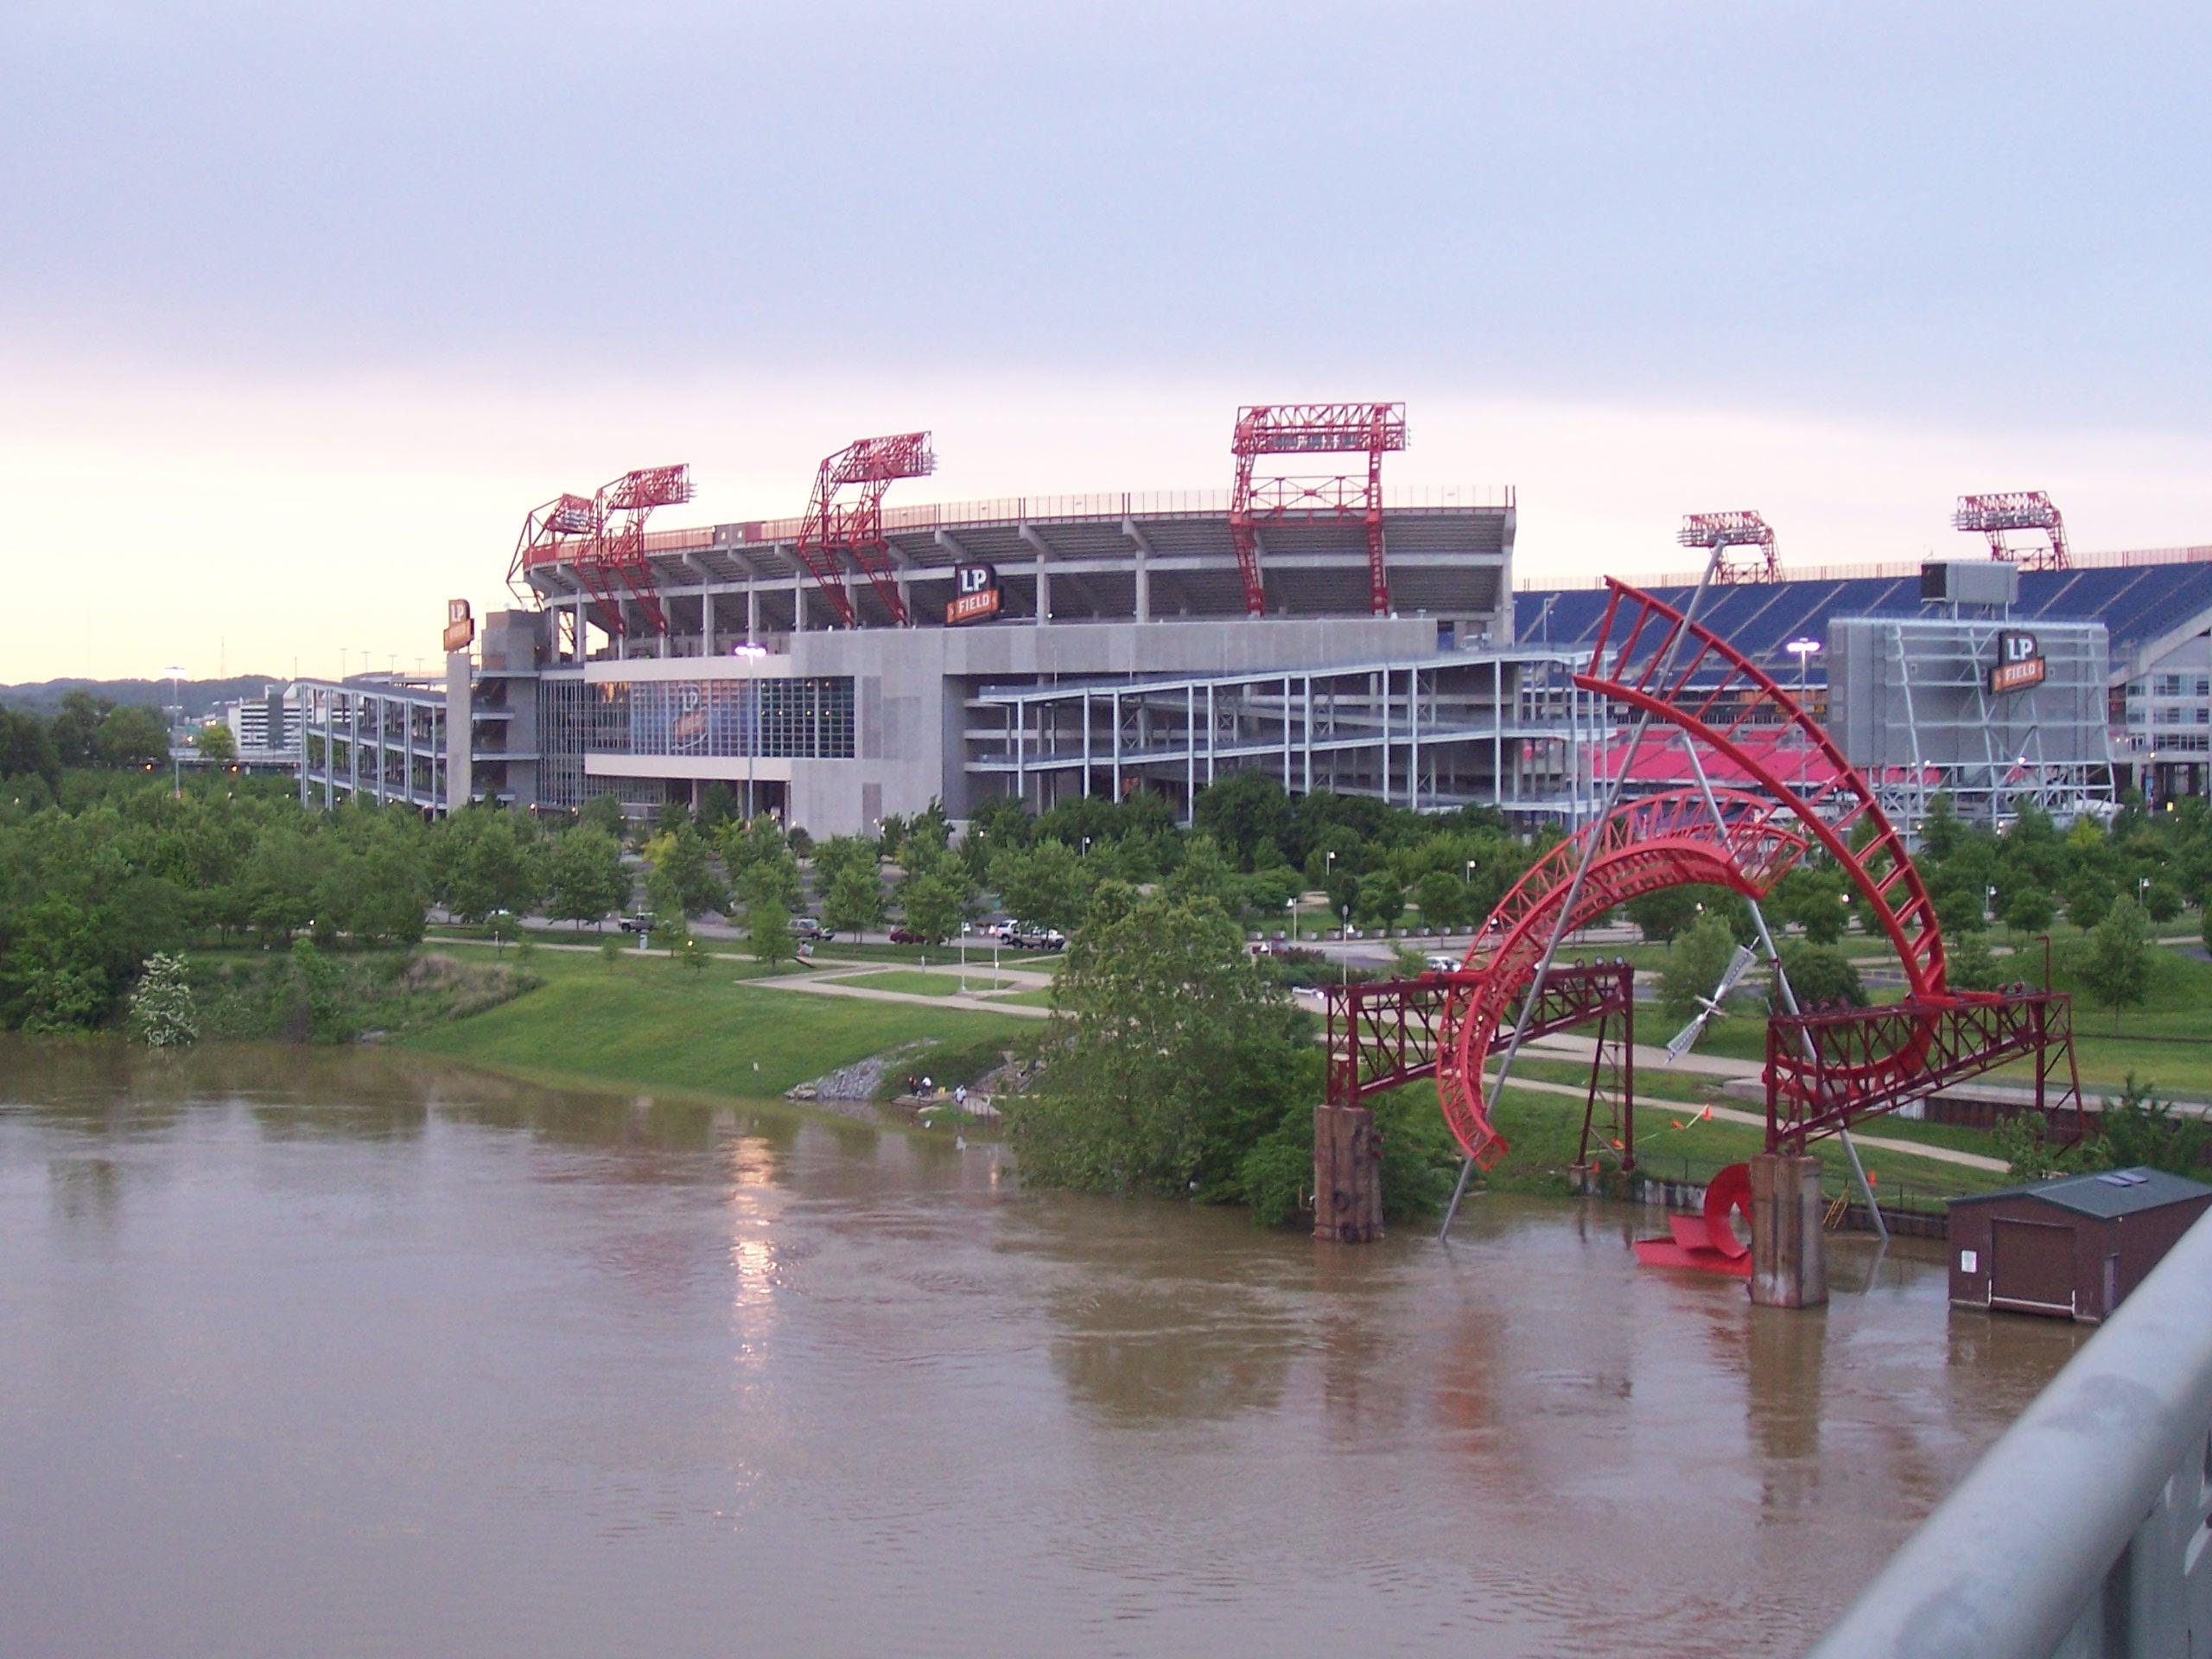 LP Stadium in Nashville, Tennessee